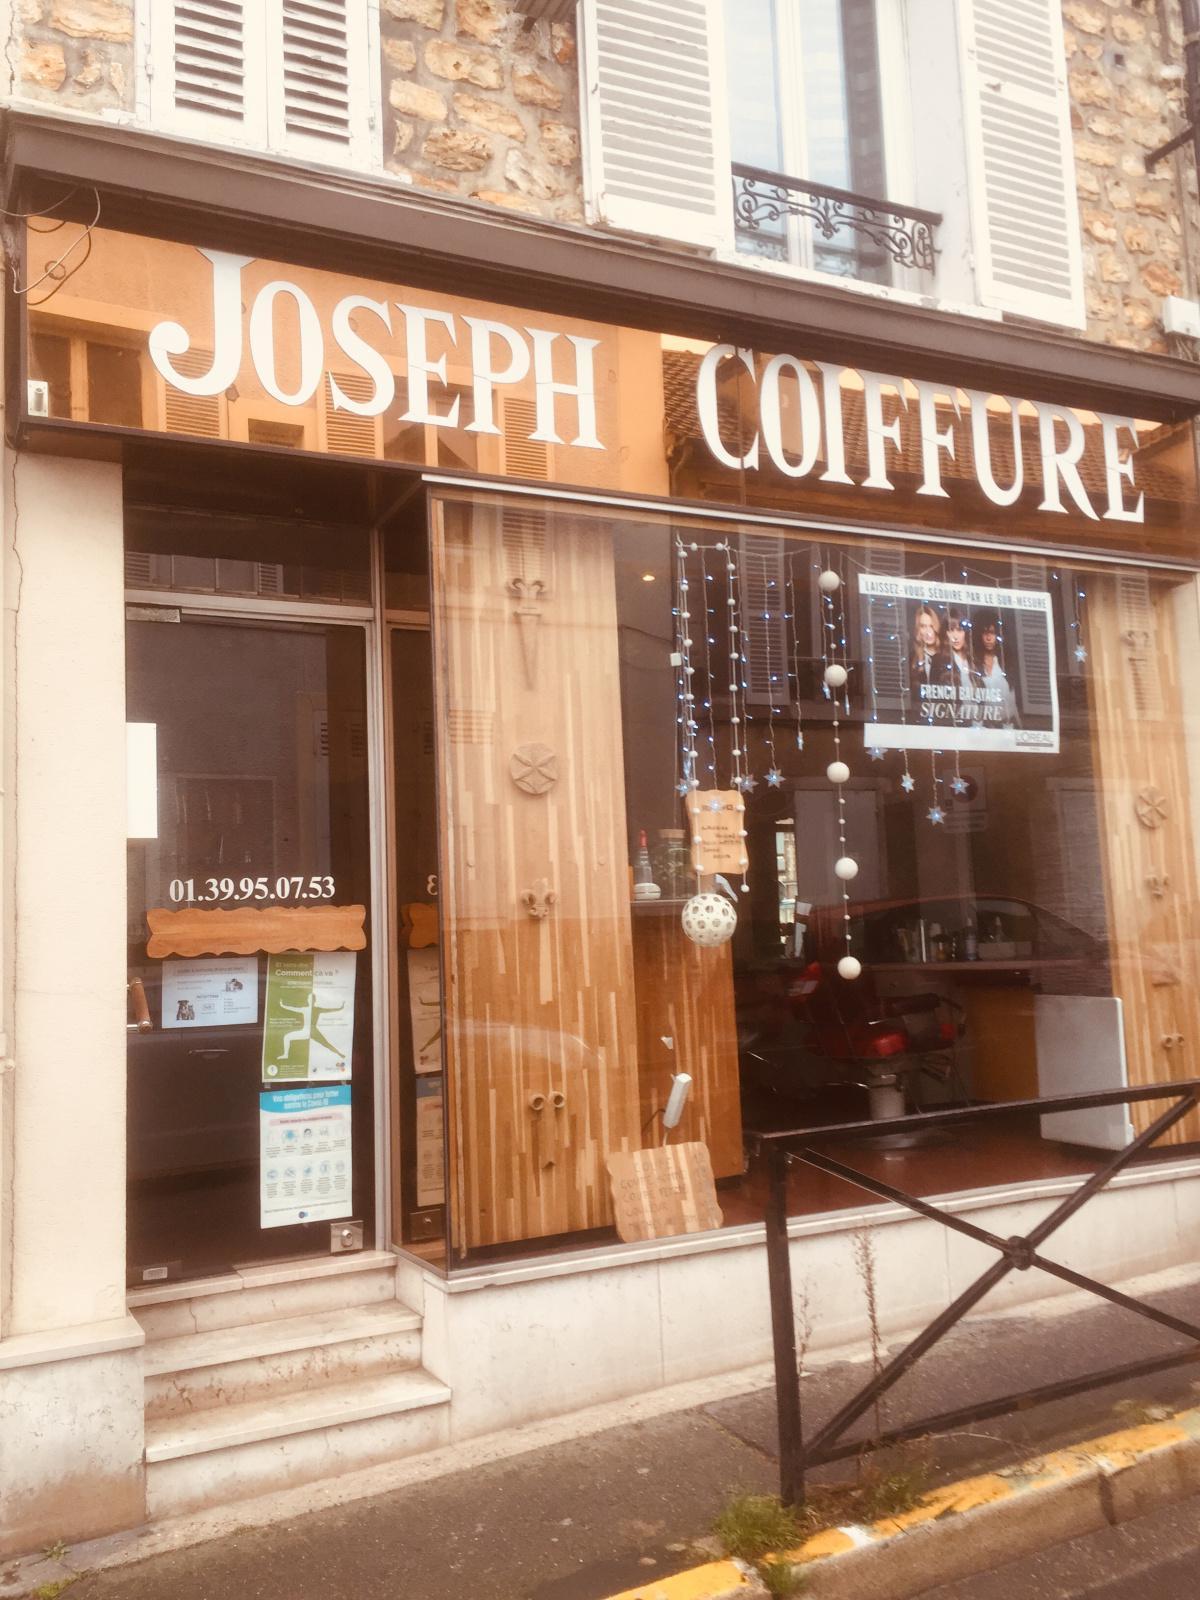 Christelle Joseph Coiffure rejoint l'appli